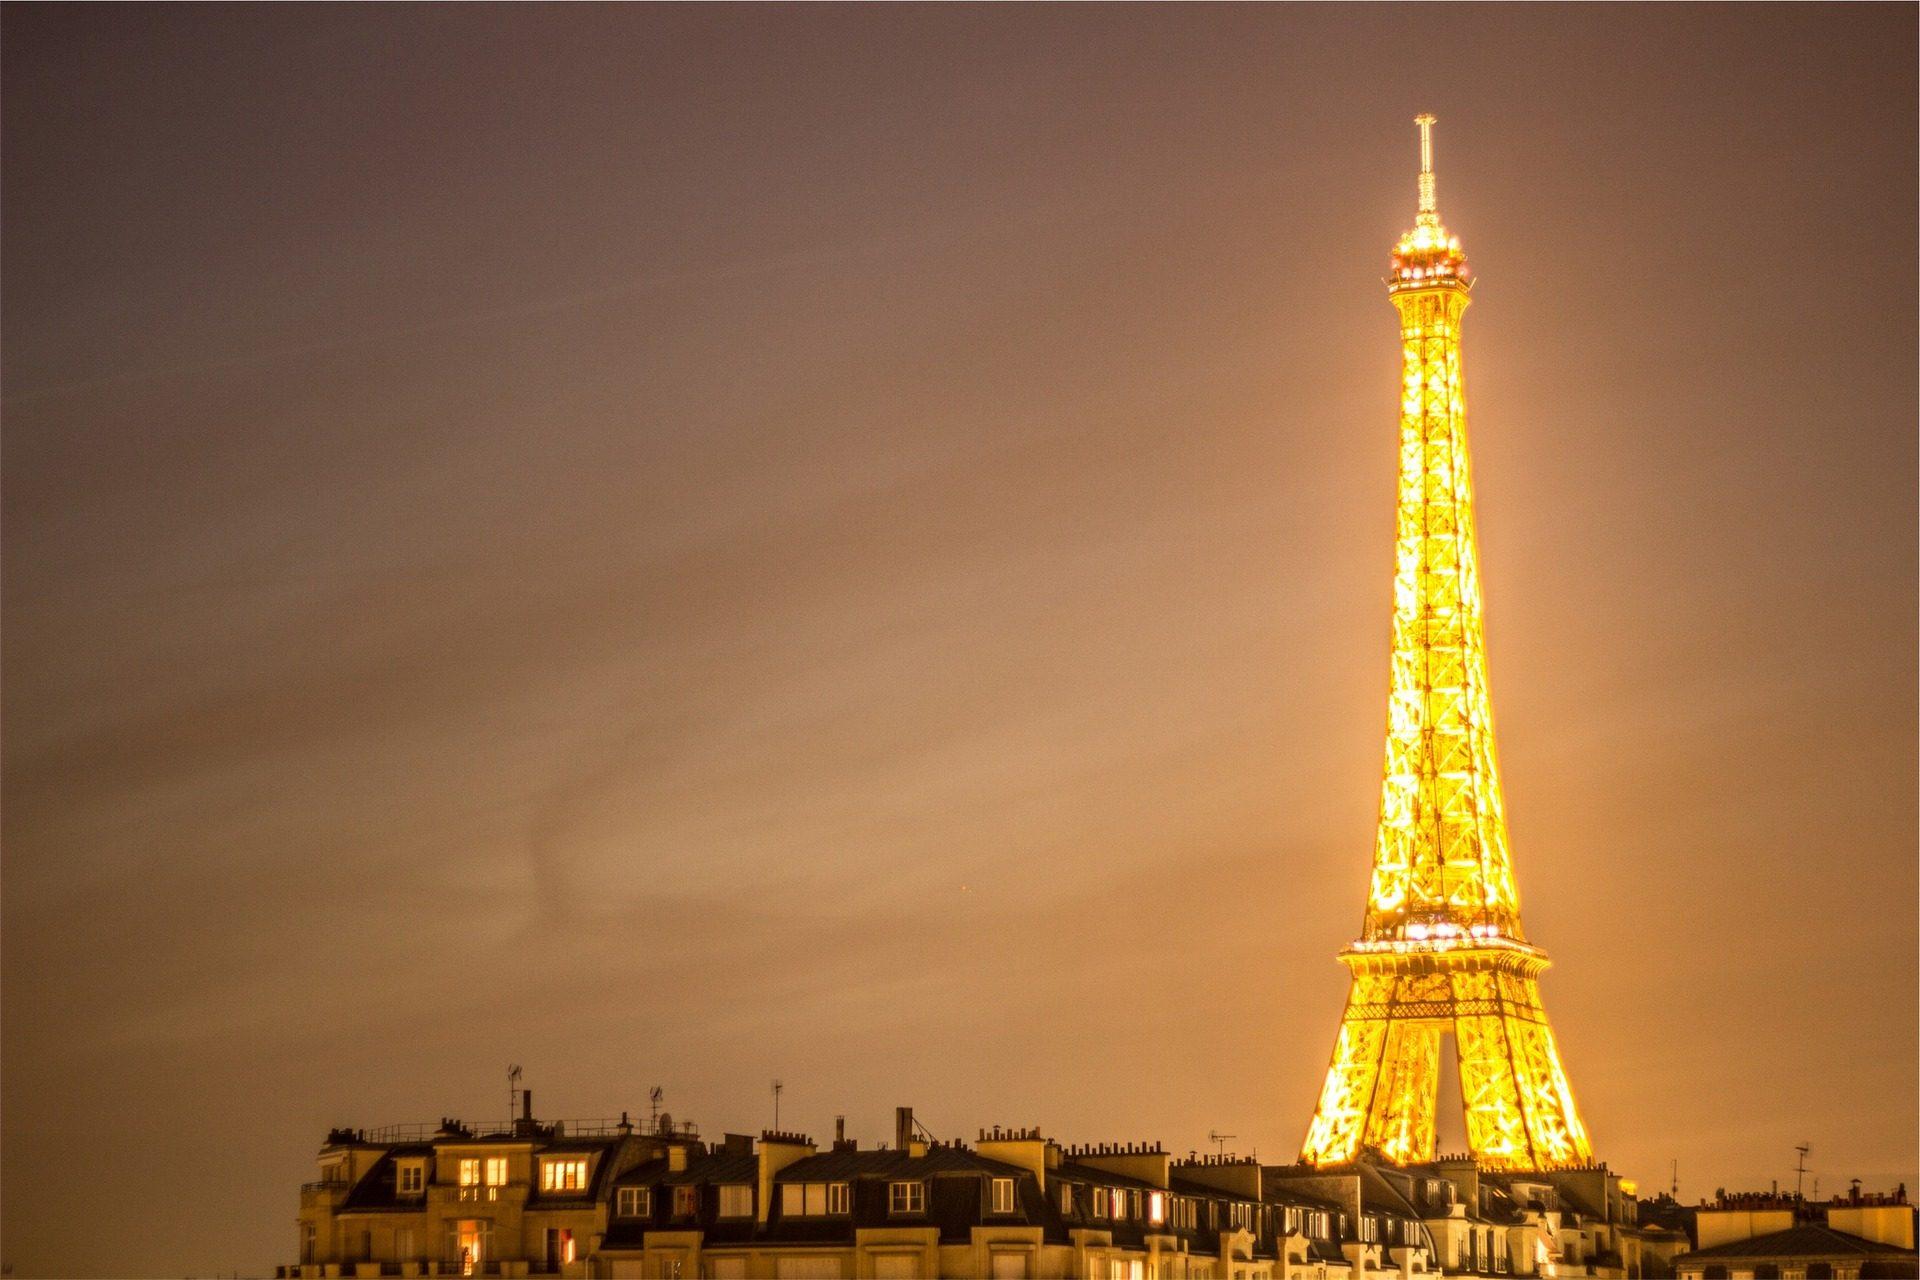 torre, eiffel, luces, iluminada, noche, parís - Fondos de Pantalla HD - professor-falken.com